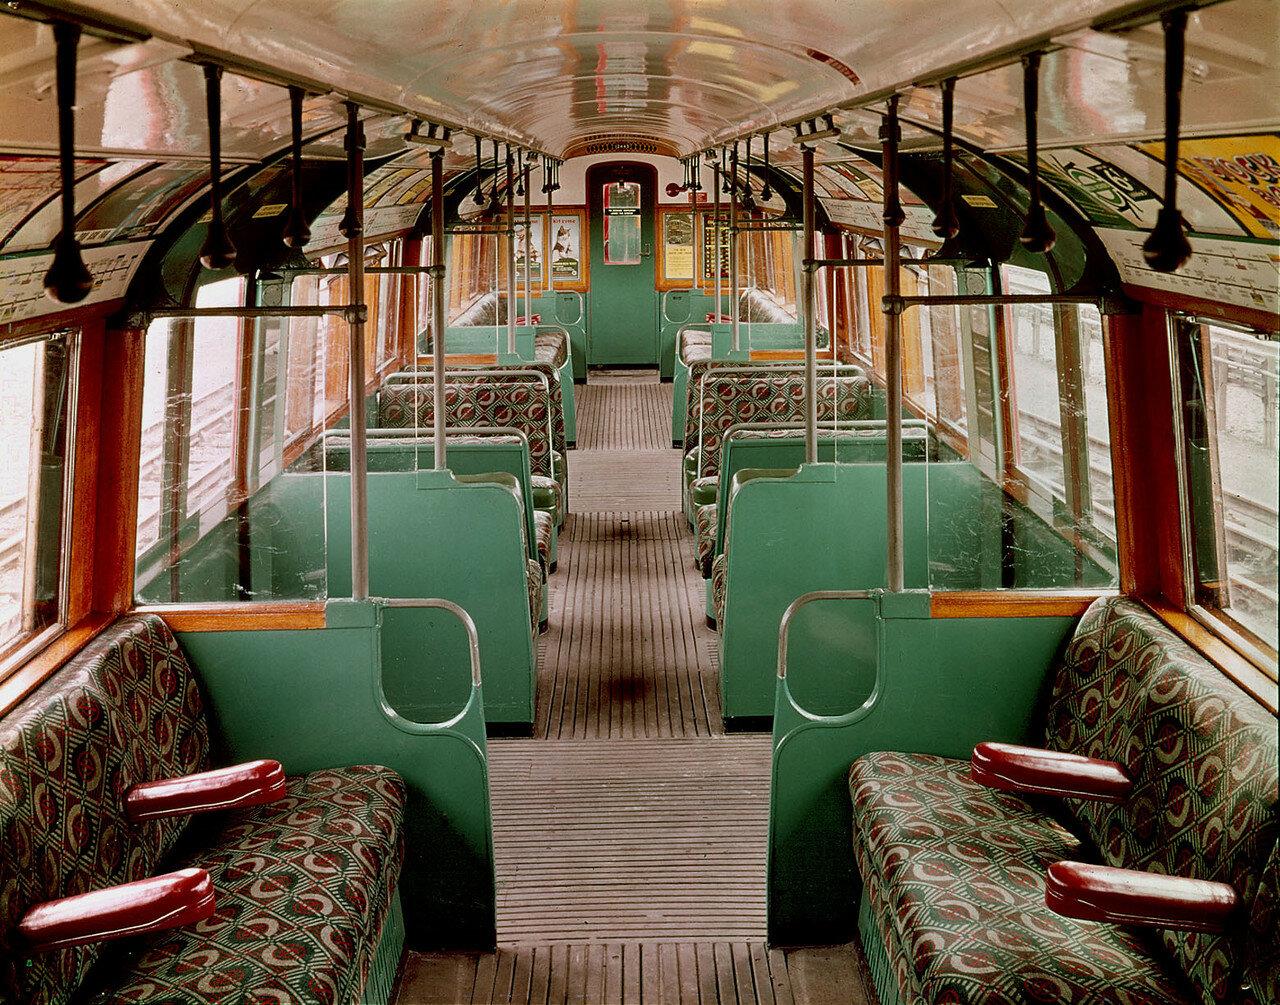 1938. Интерьер вагона поезда лондонского метро